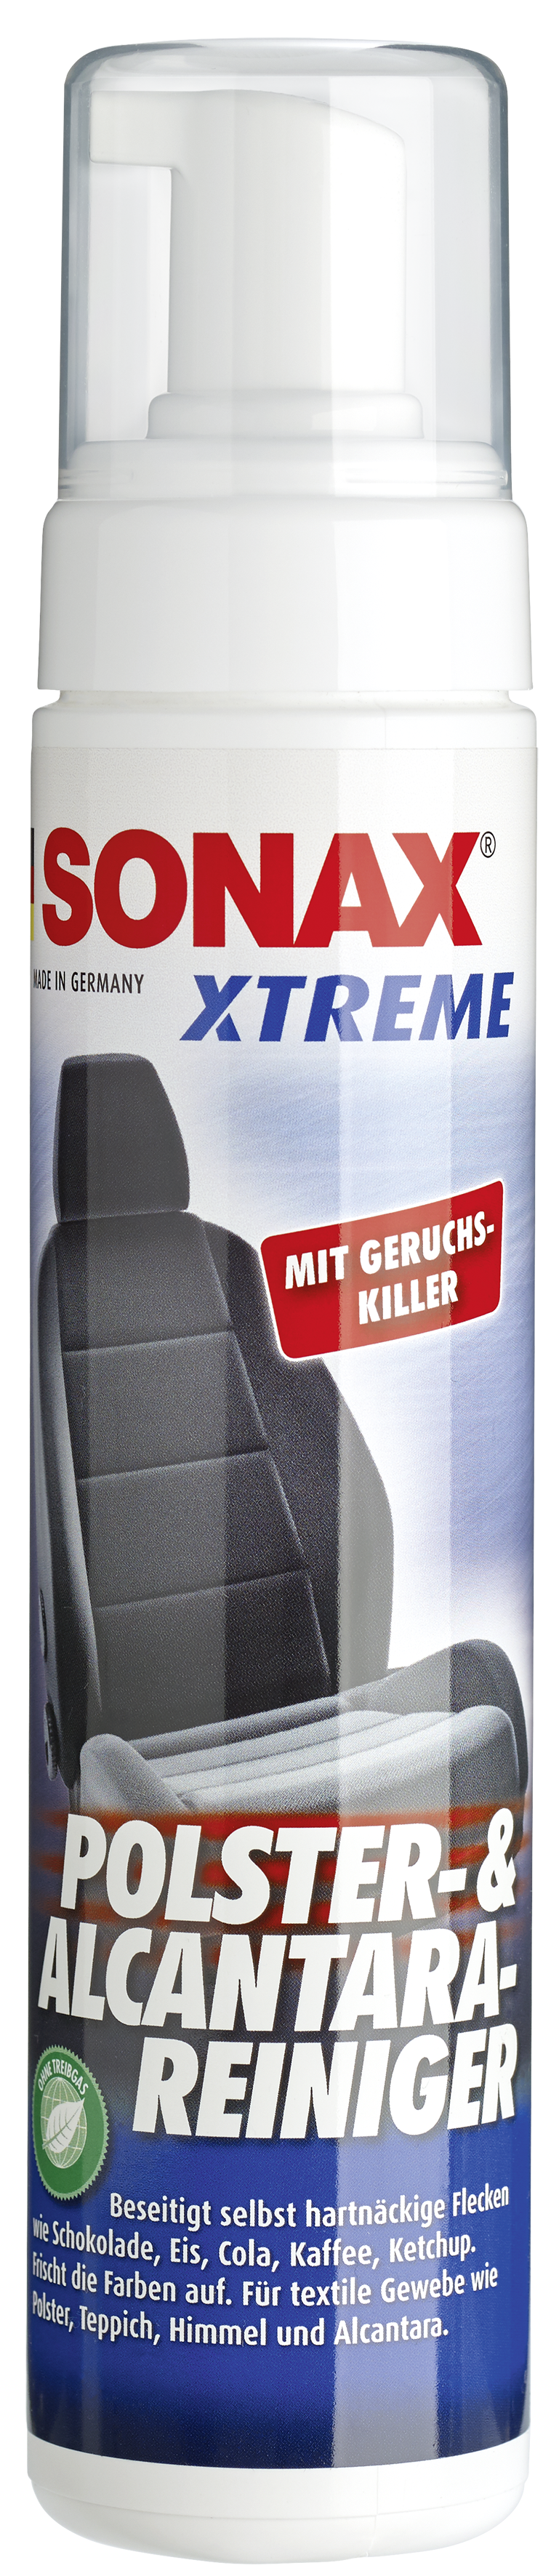 flowmaxx autopflege sonax xtreme polster. Black Bedroom Furniture Sets. Home Design Ideas